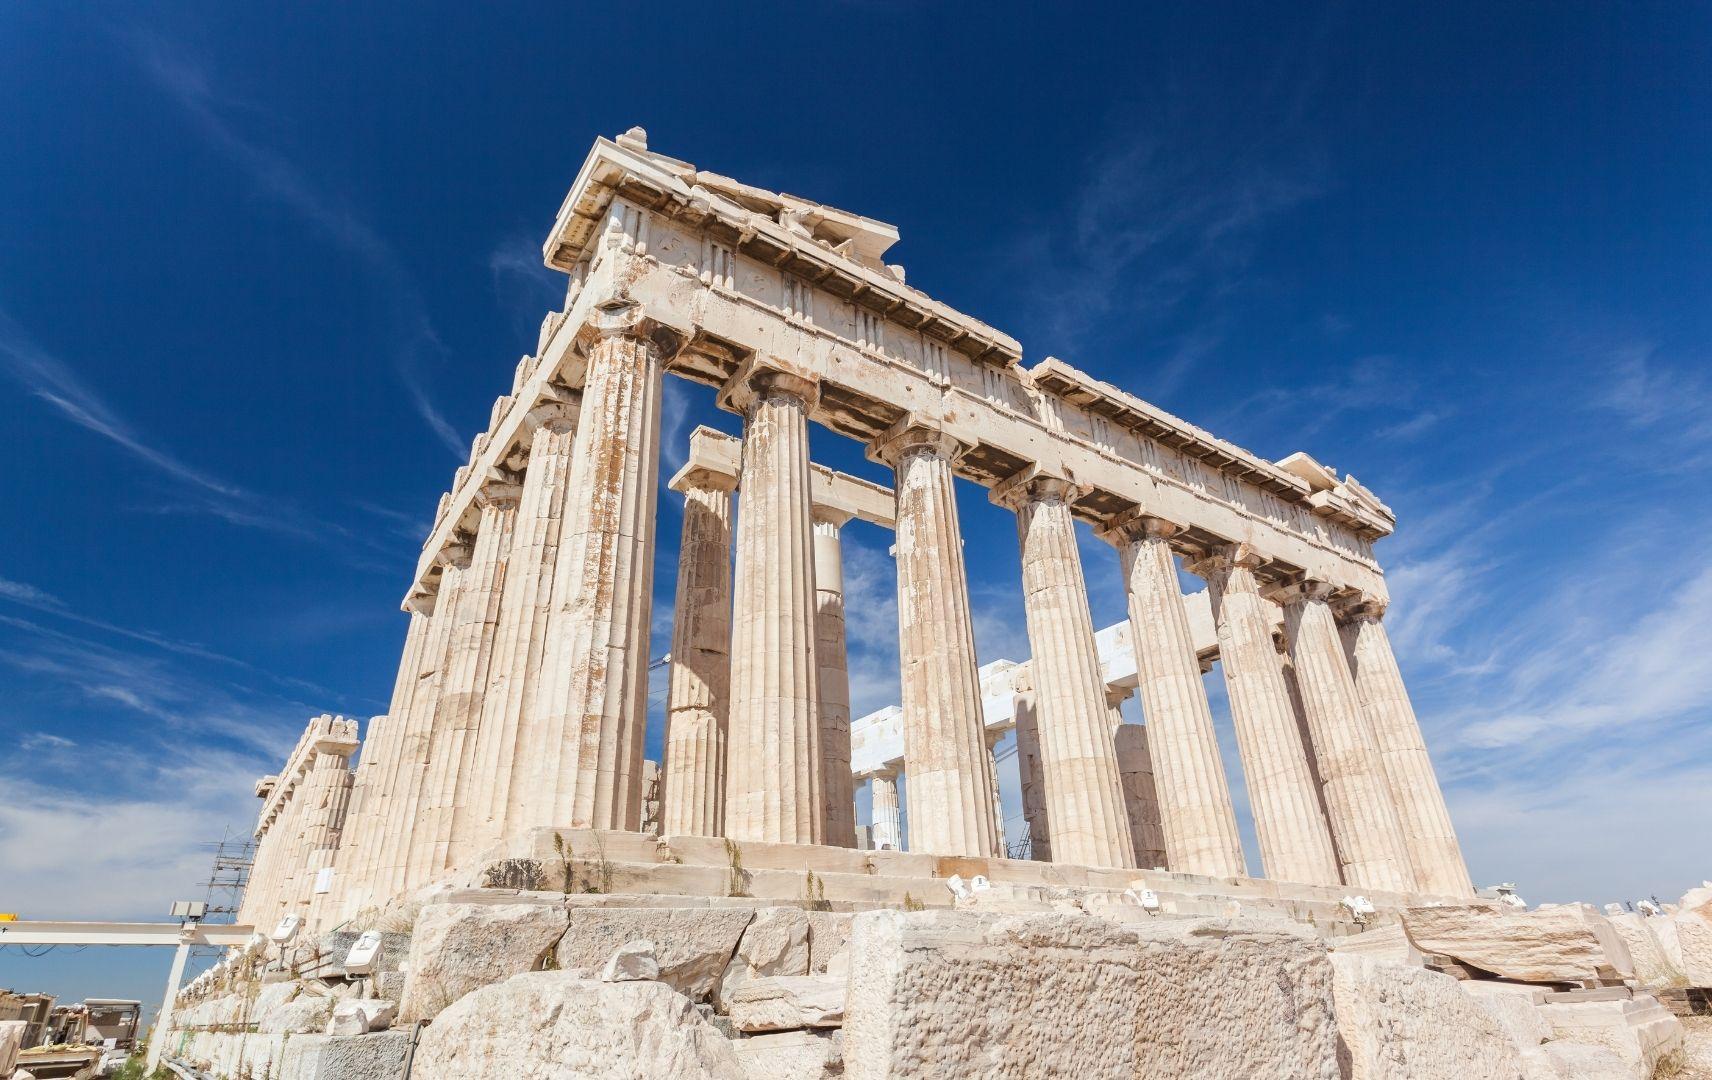 Reiseziel - Griechenland, Parthenon Athen